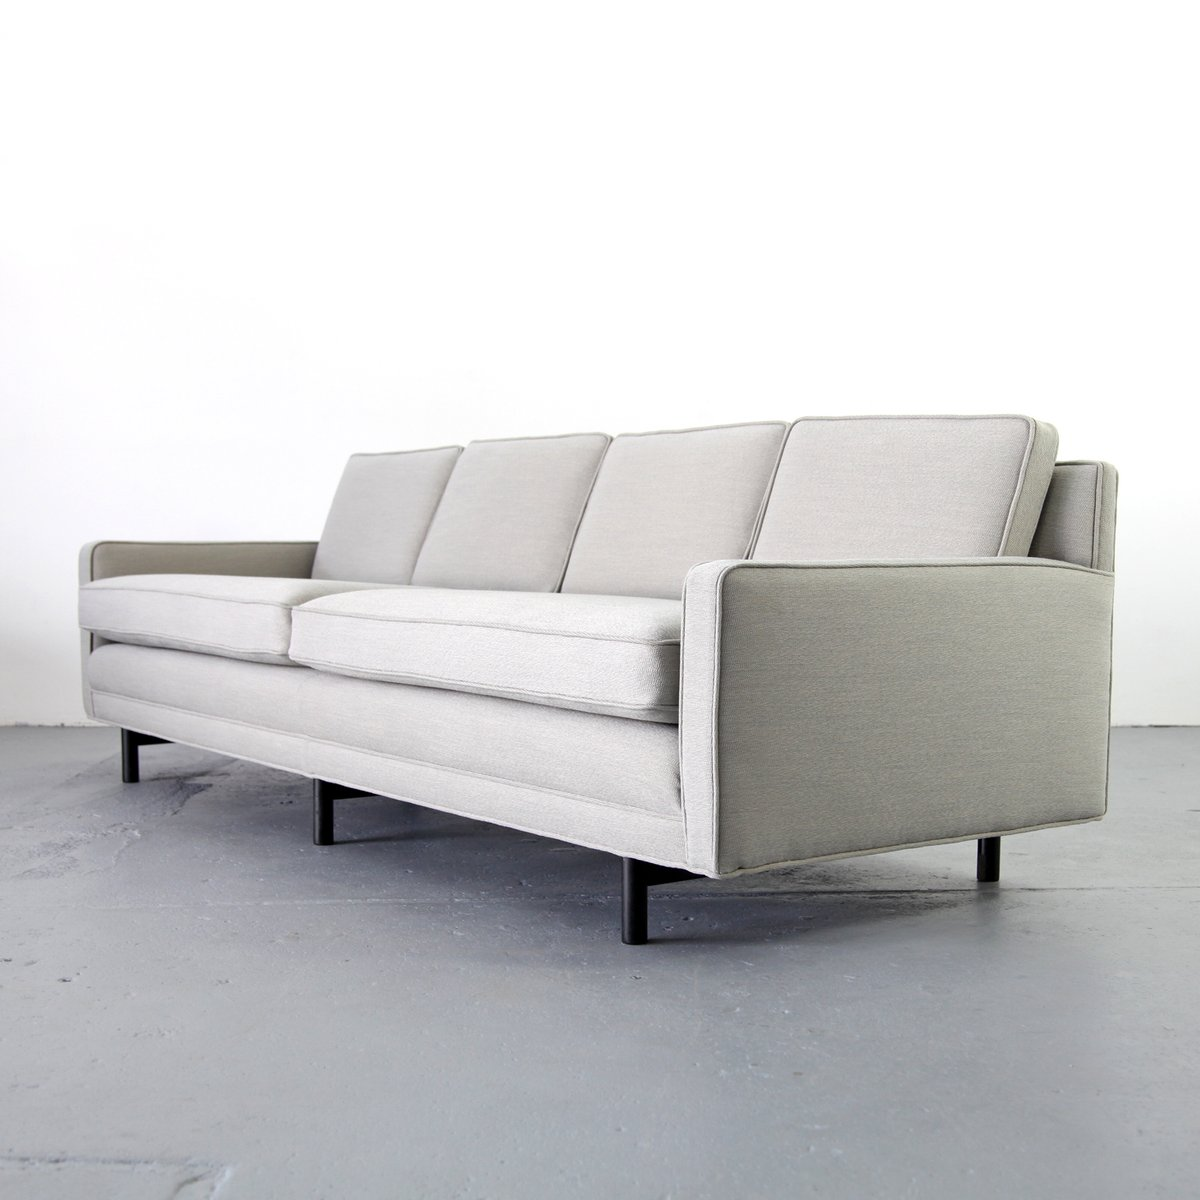 4 sitzer sofa von paul mccobb f r directional bei pamono. Black Bedroom Furniture Sets. Home Design Ideas